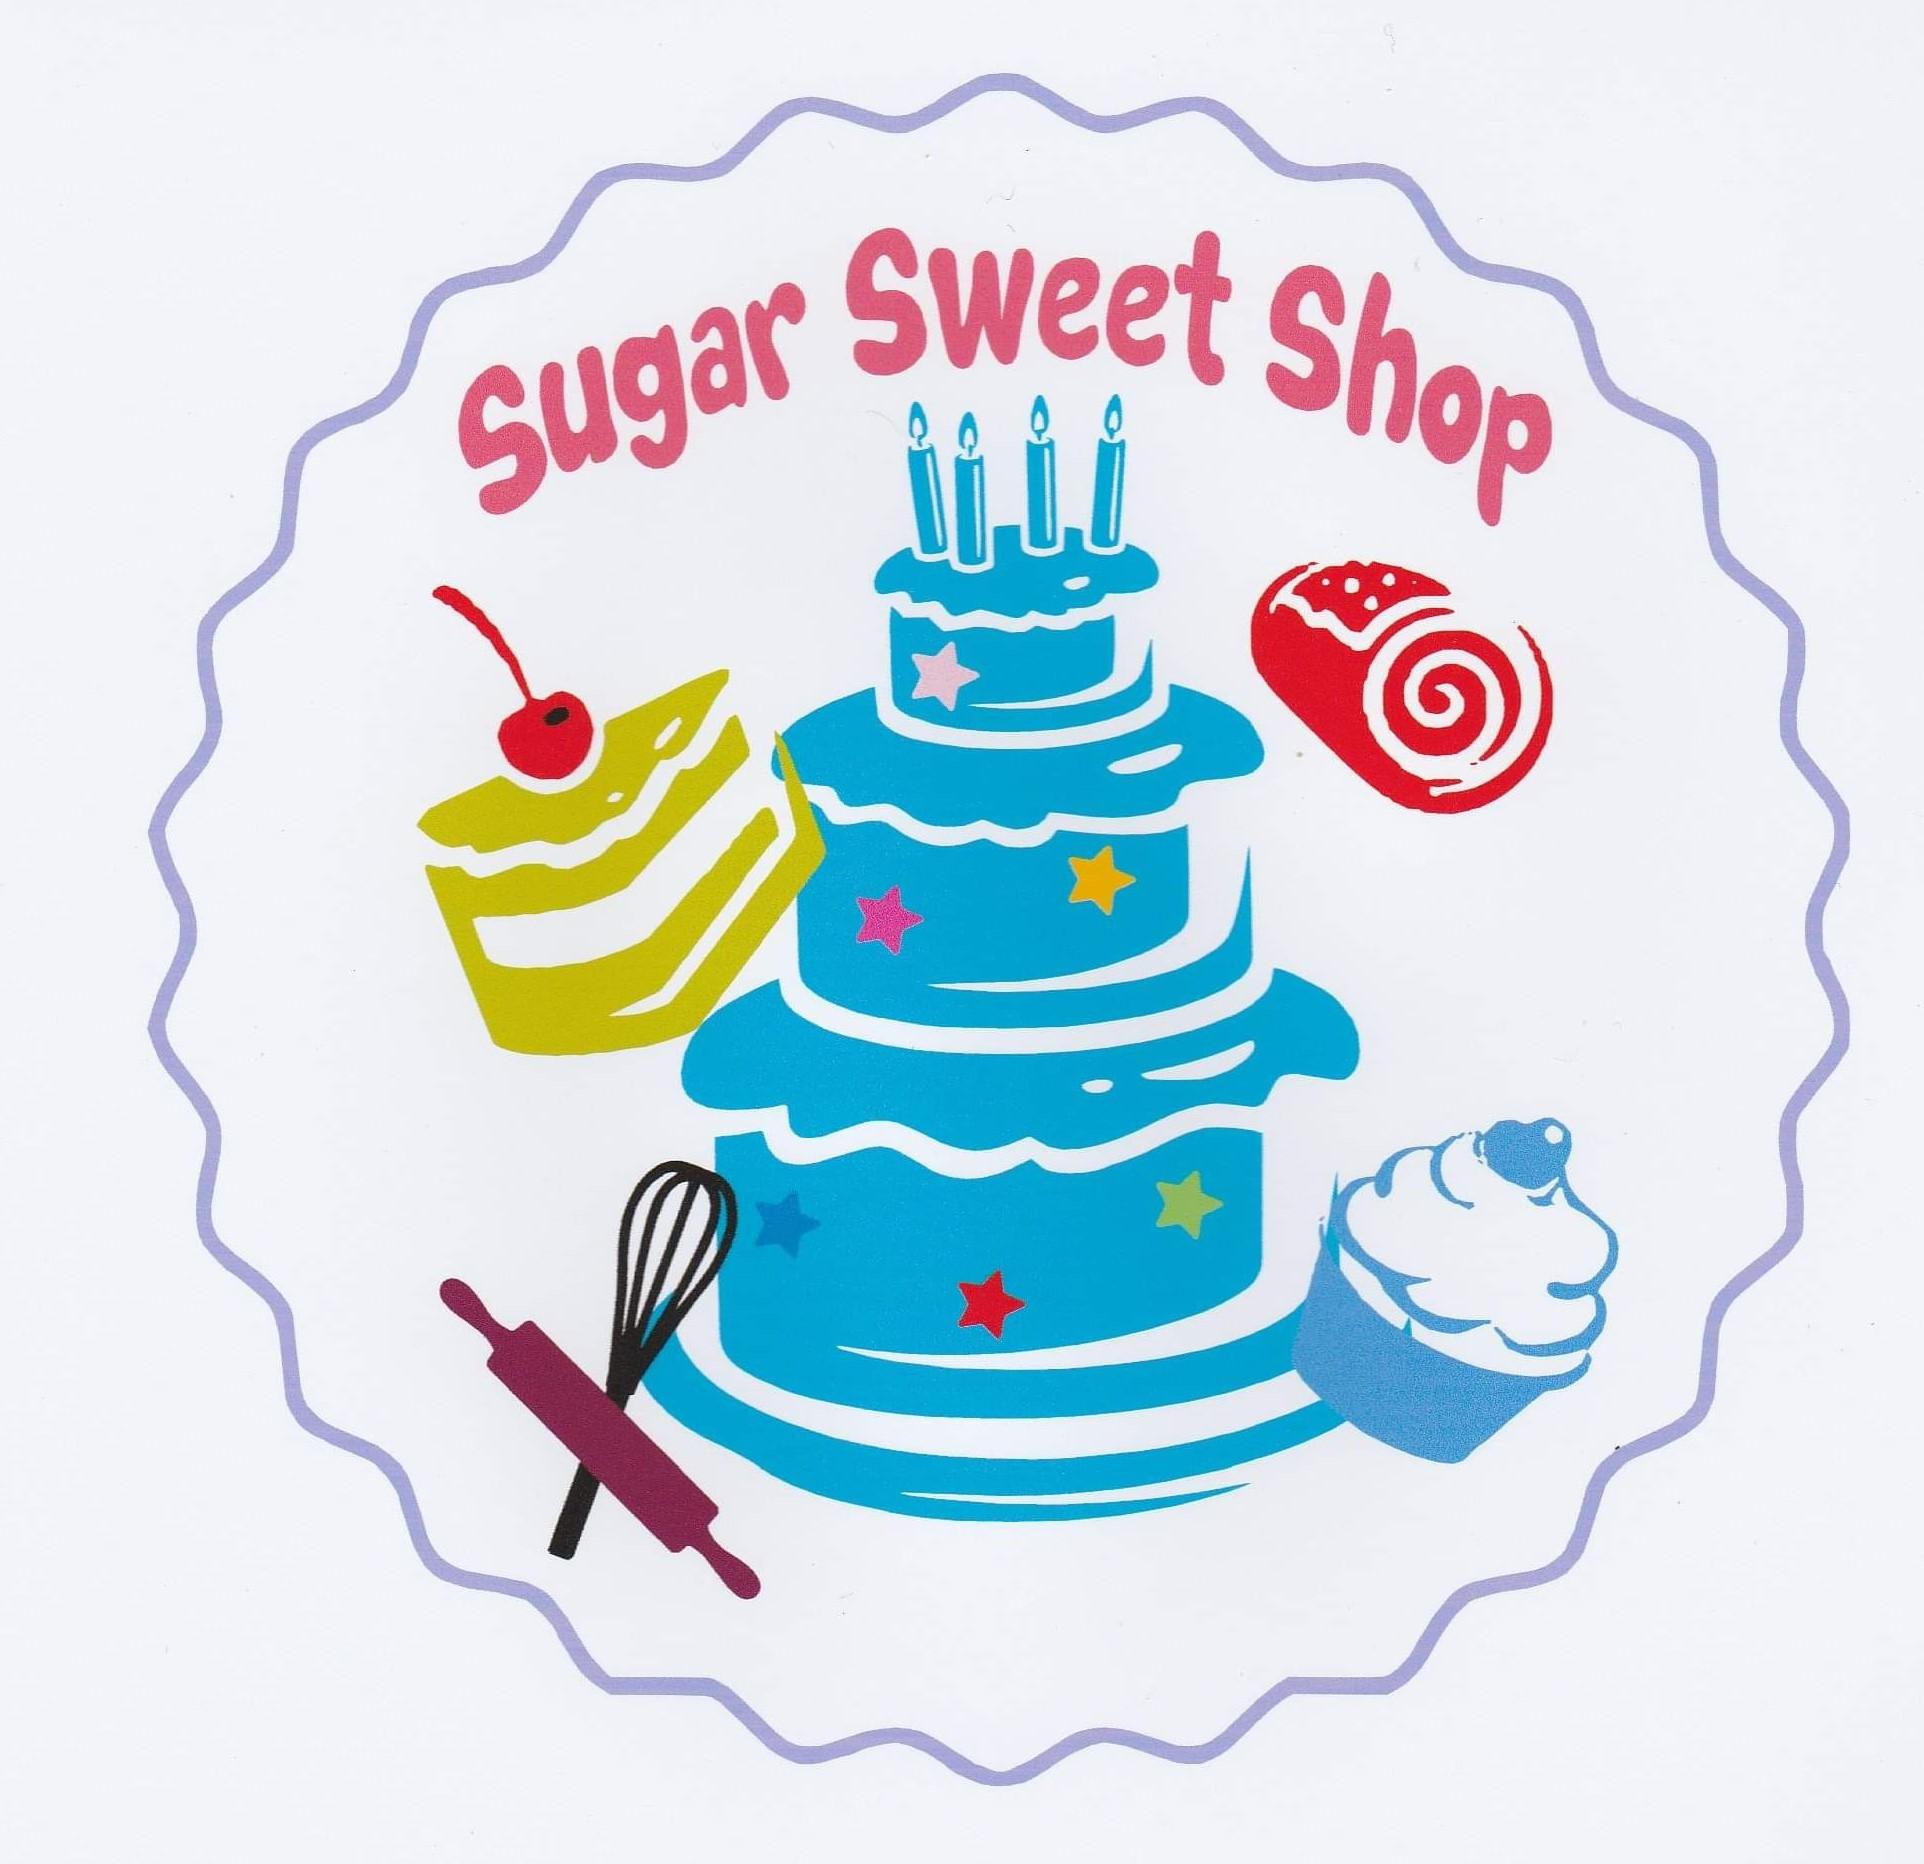 Sugar Sweet Shop